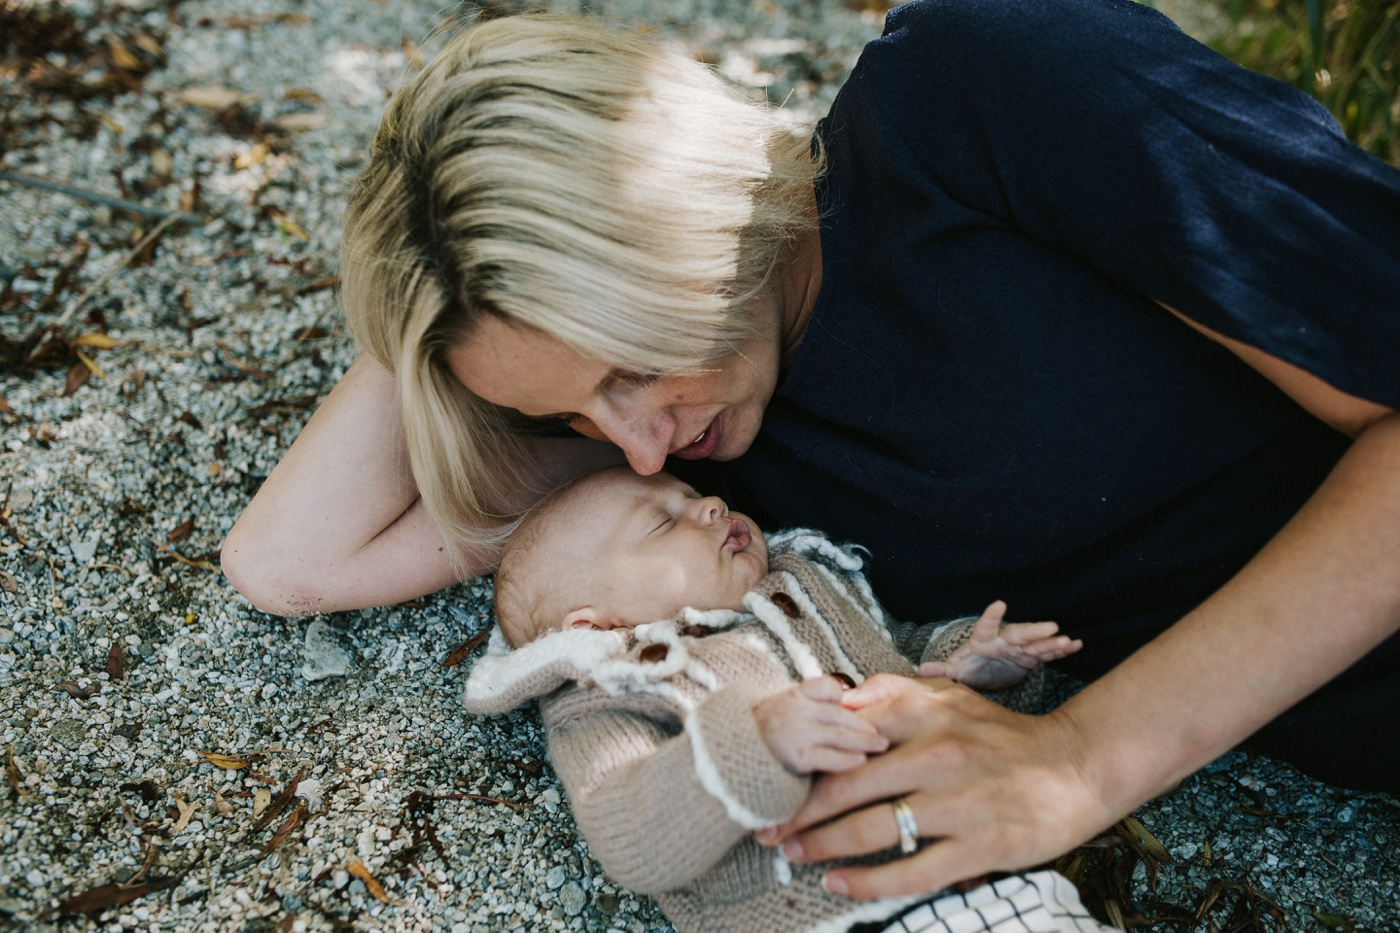 Blake-Lily-Rolig-Lekfull-Familjesession-Familjefotograf-Stockholm-Orebro_23